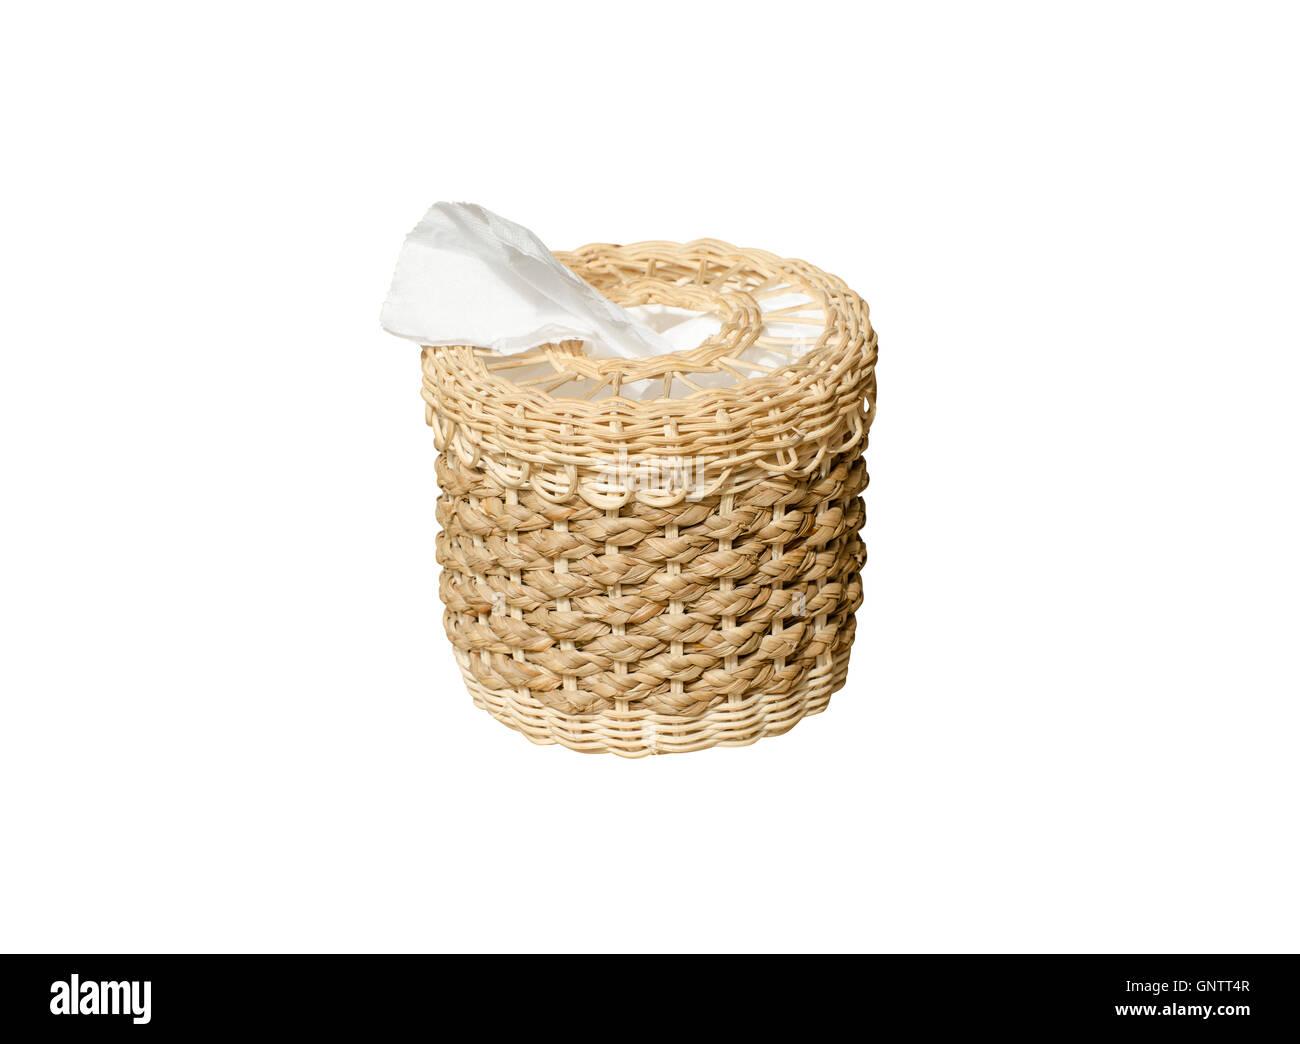 Tissue Box isolate on white background, wickerwork - Stock Image